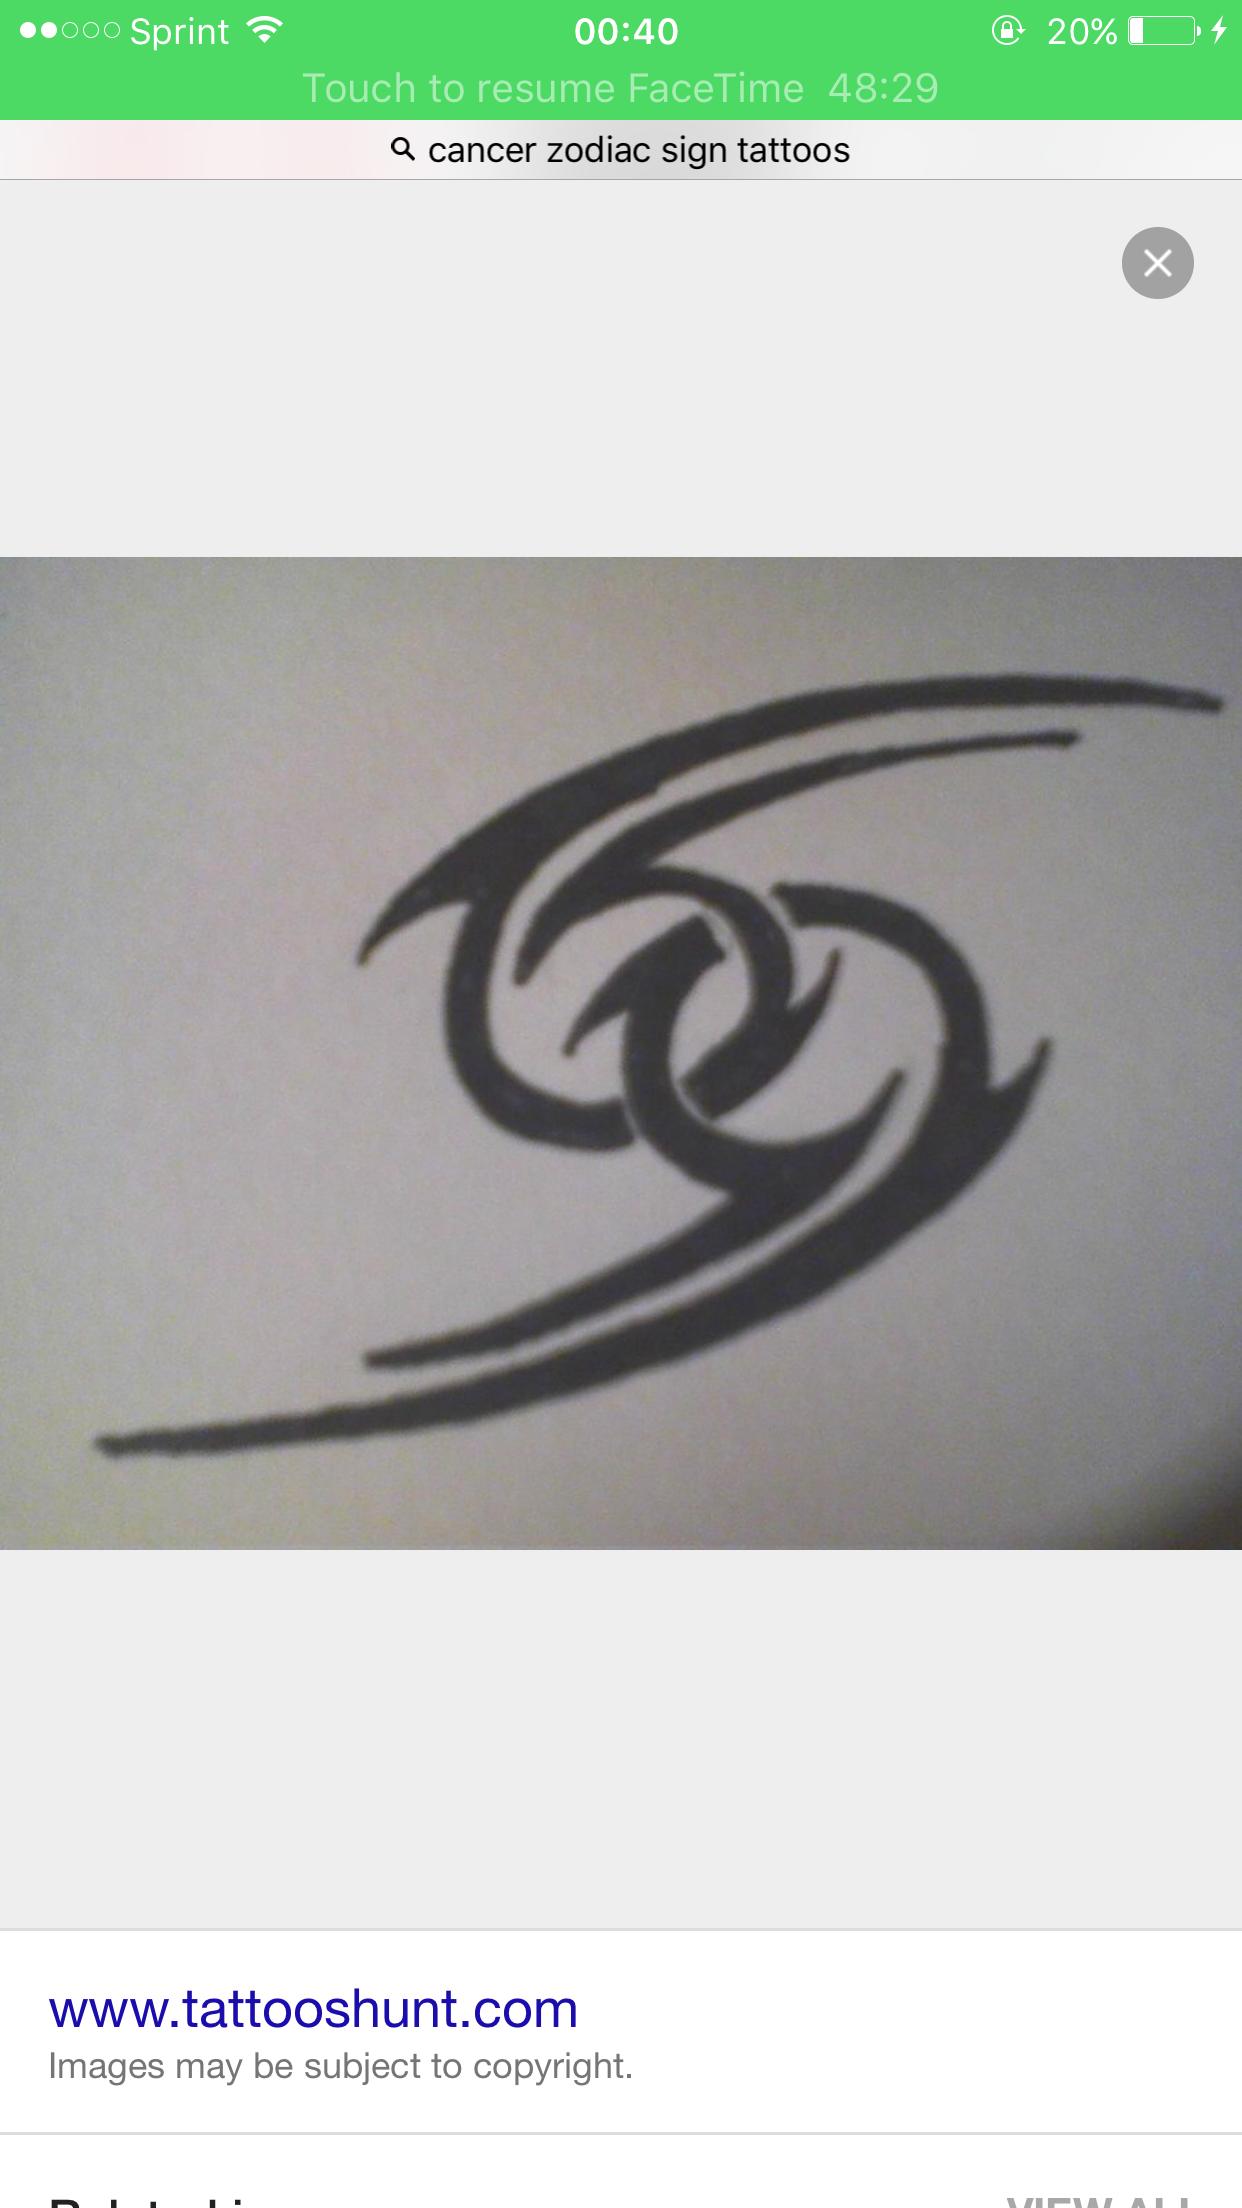 Cancer Zodiac Sign Medium Sized Tattoo Com